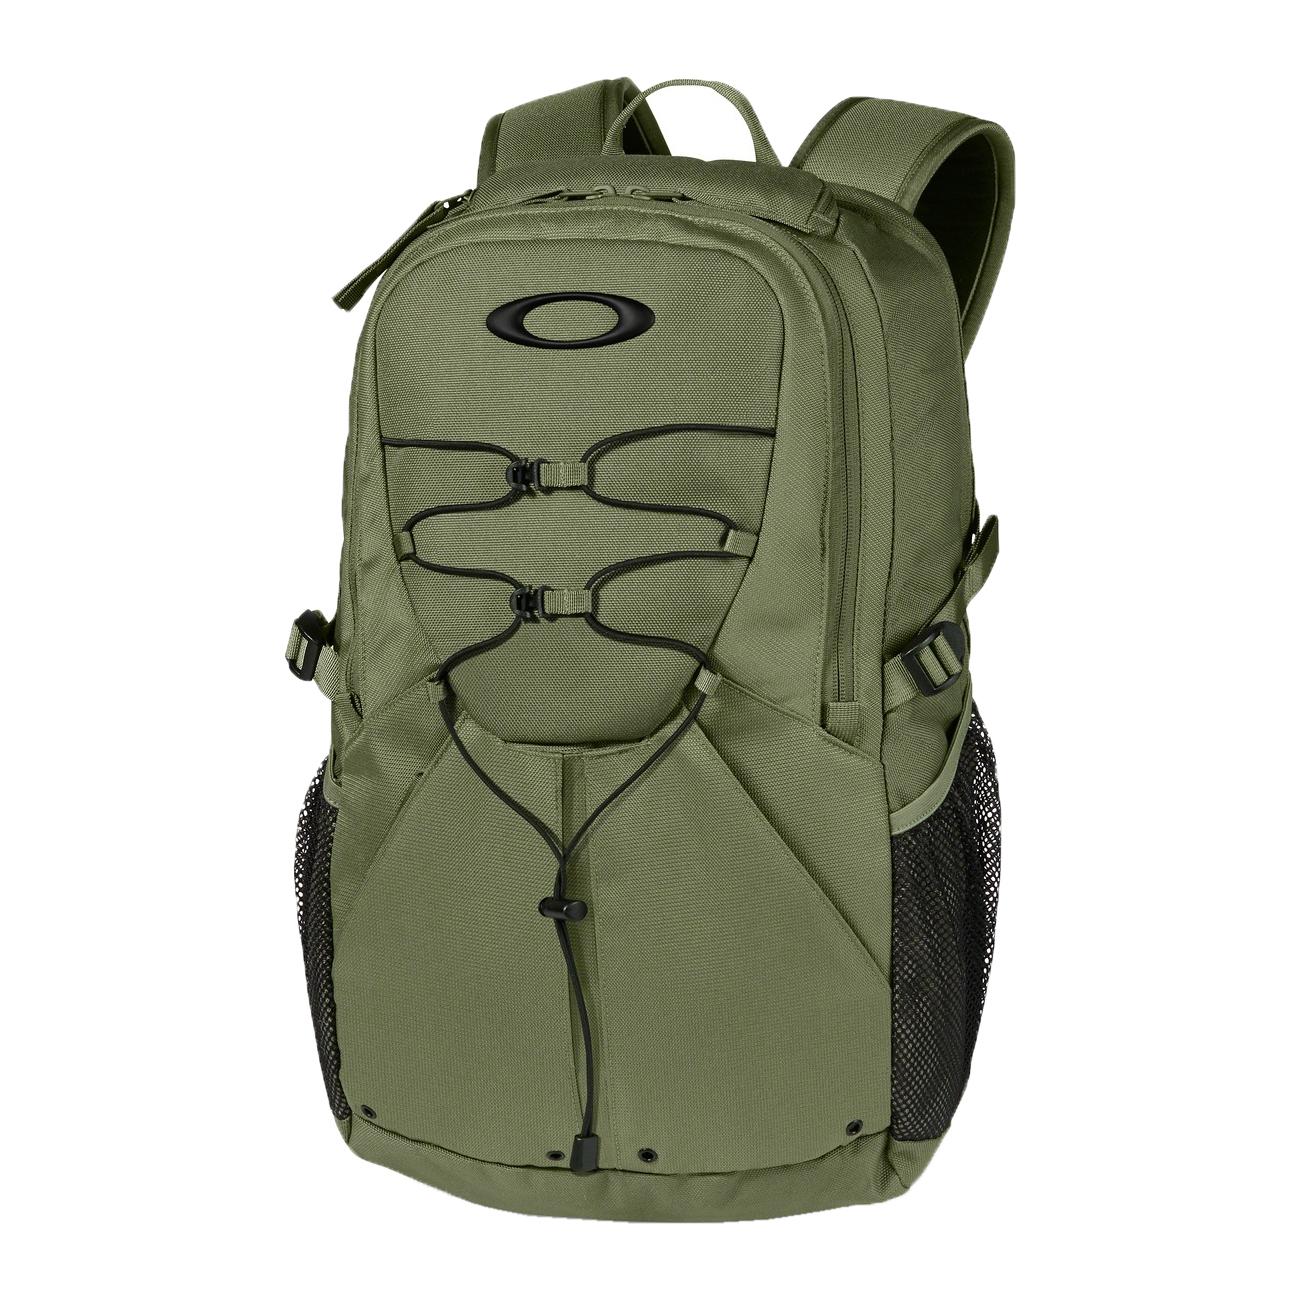 Oakley Tactical Backpack Www Tapdance Org